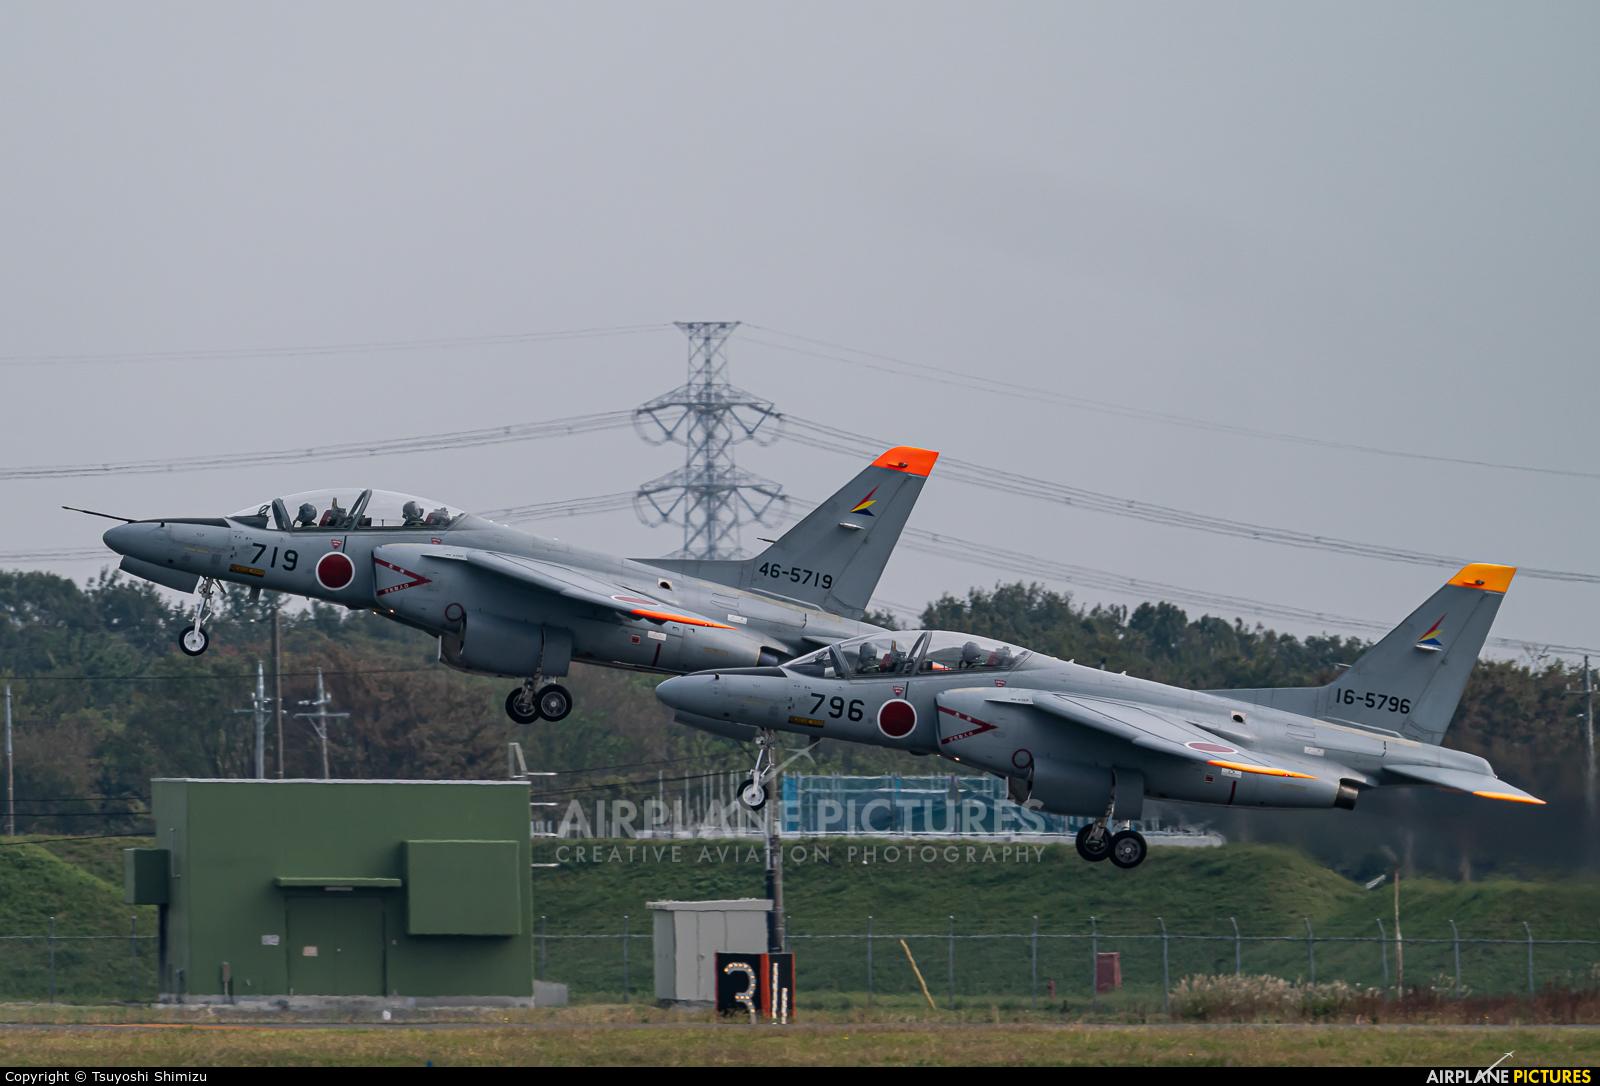 Japan - Air Self Defence Force 46-5719 aircraft at Iruma AB